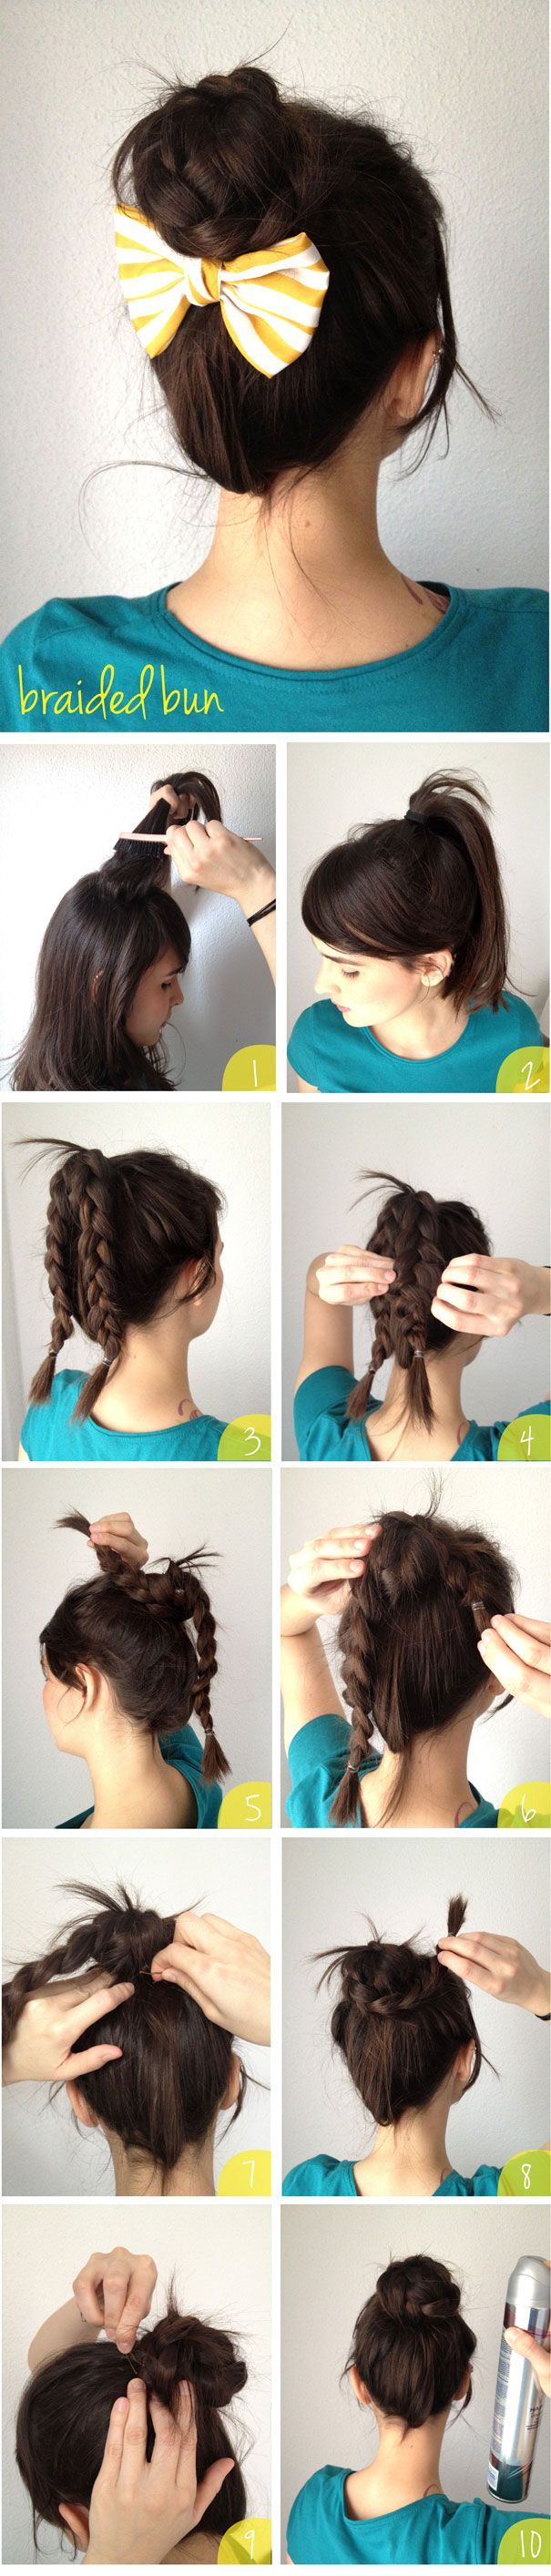 Stunning Braided Hairstyle Tutorials to Master : # 21 : Braided Bun